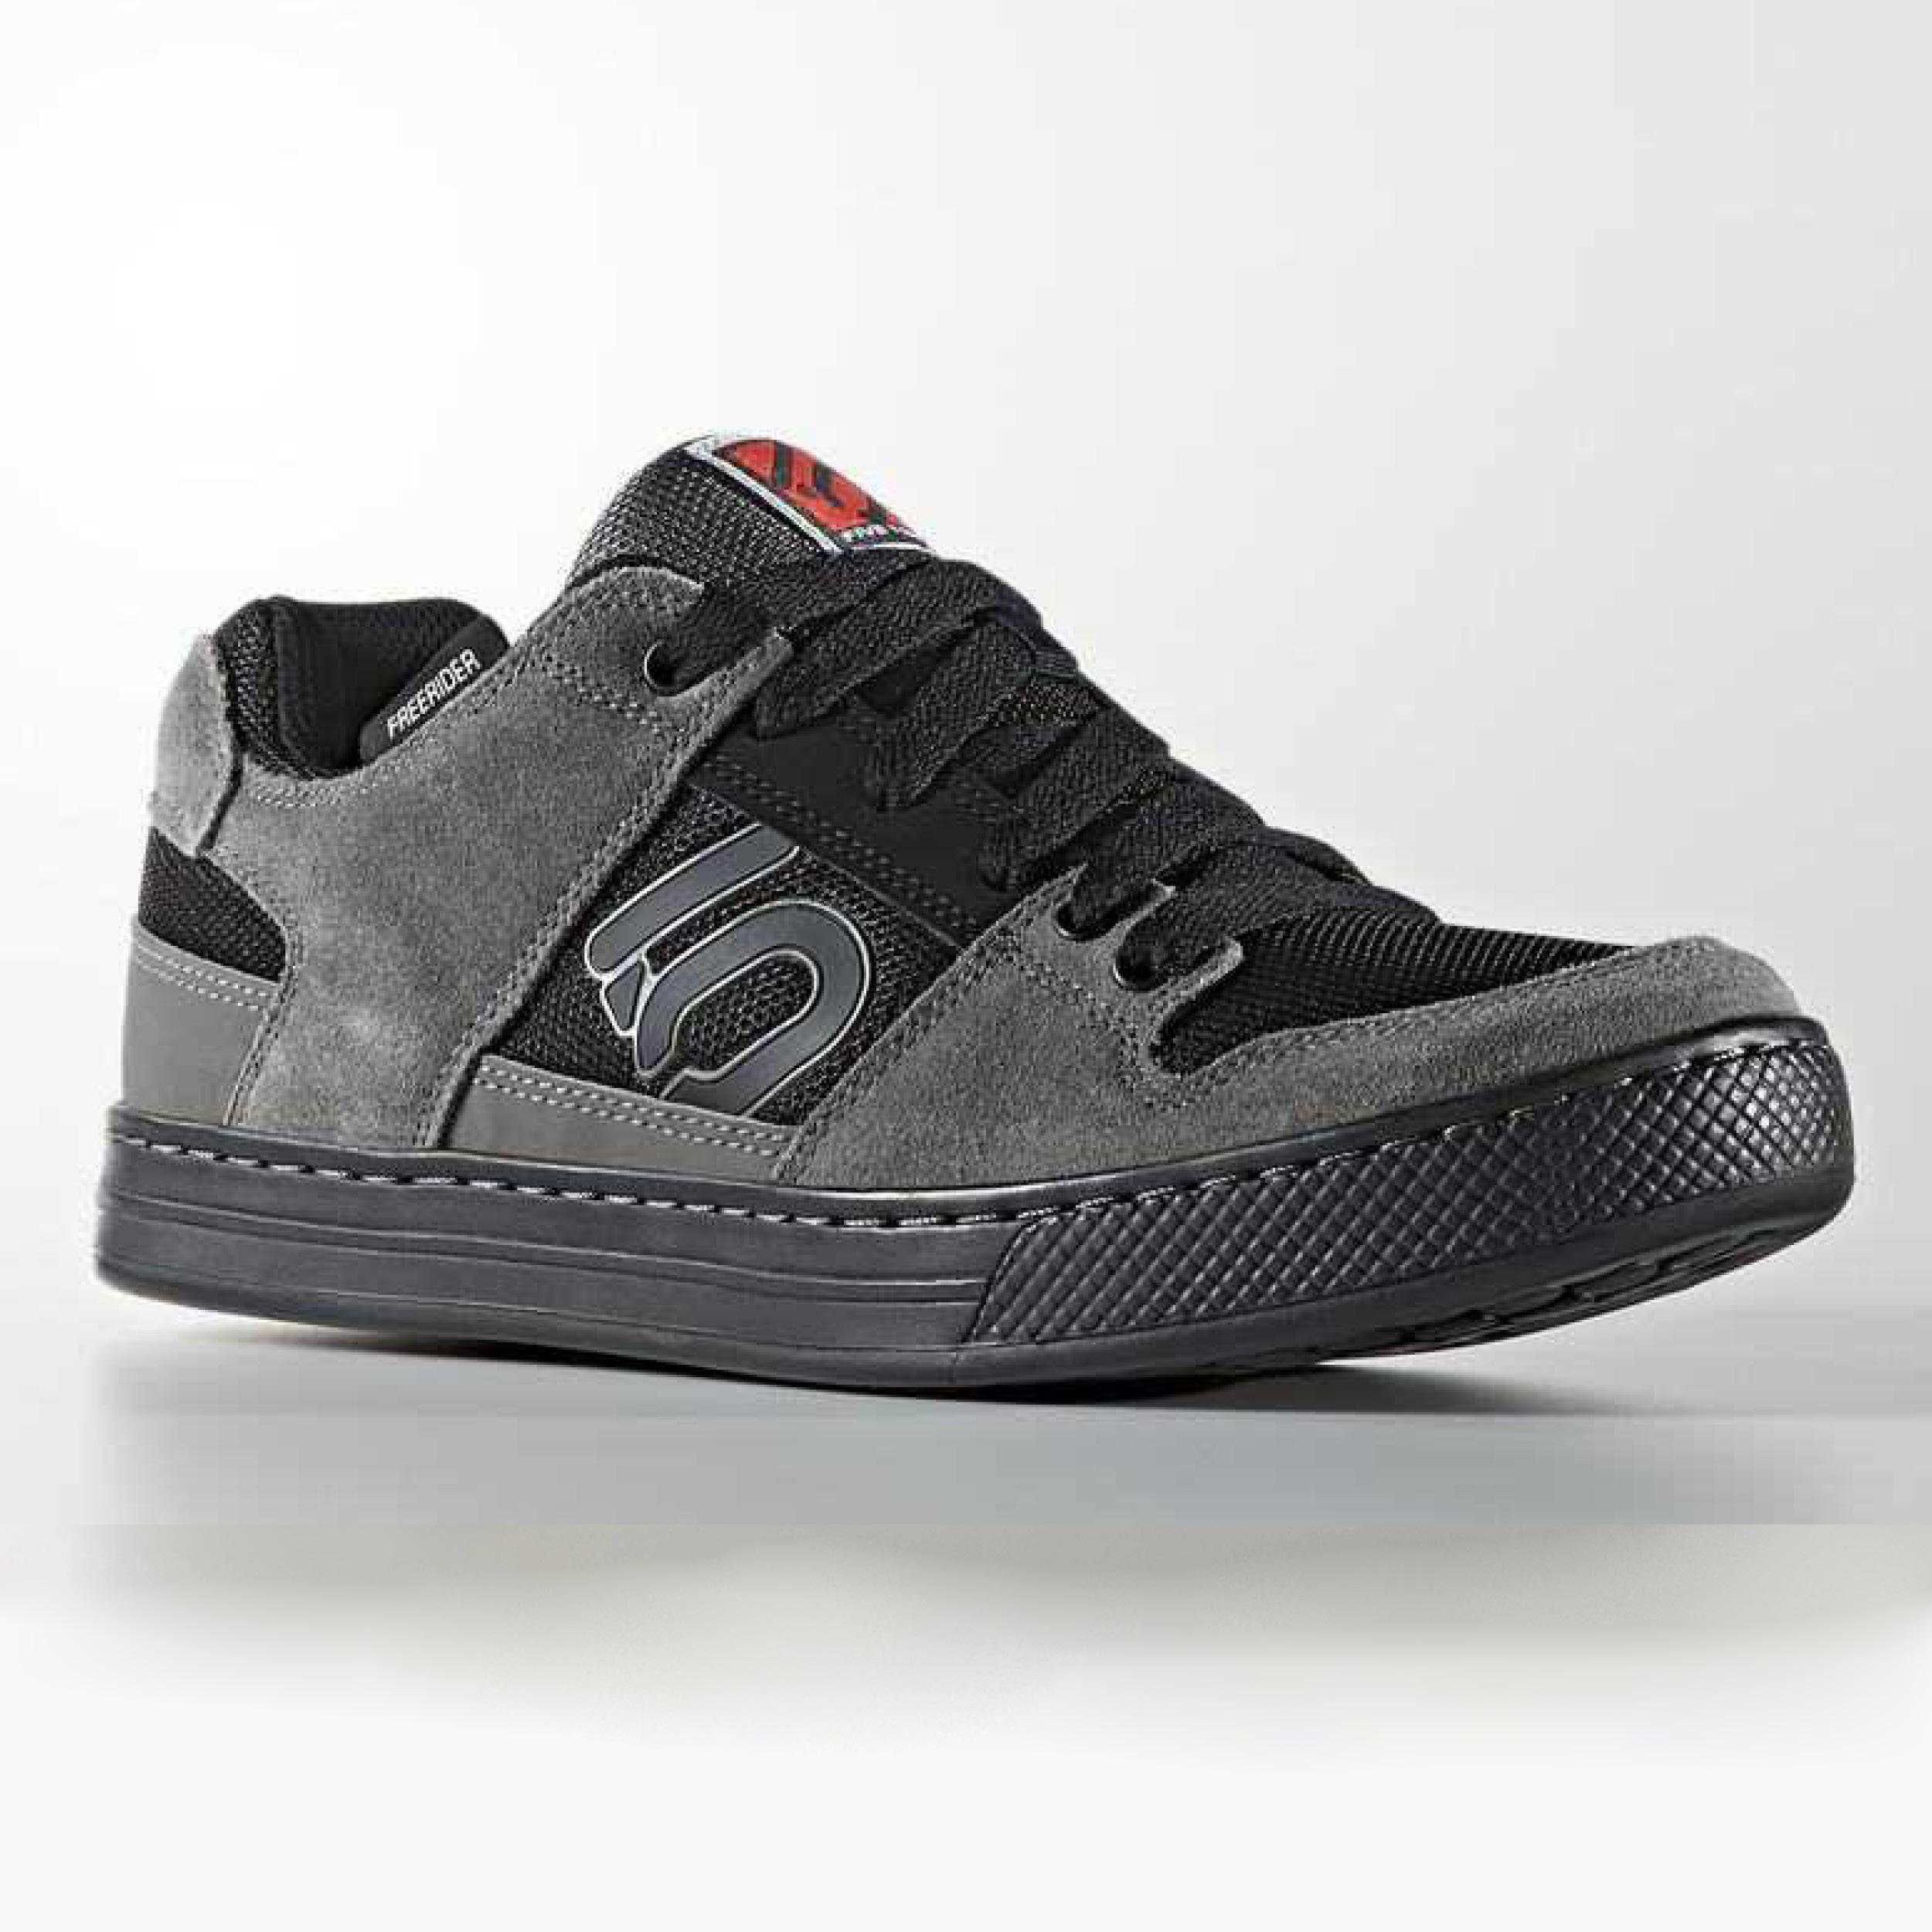 887fbceb3b9d57 Five Ten Freerider MTB Shoes Black Grey £90.00